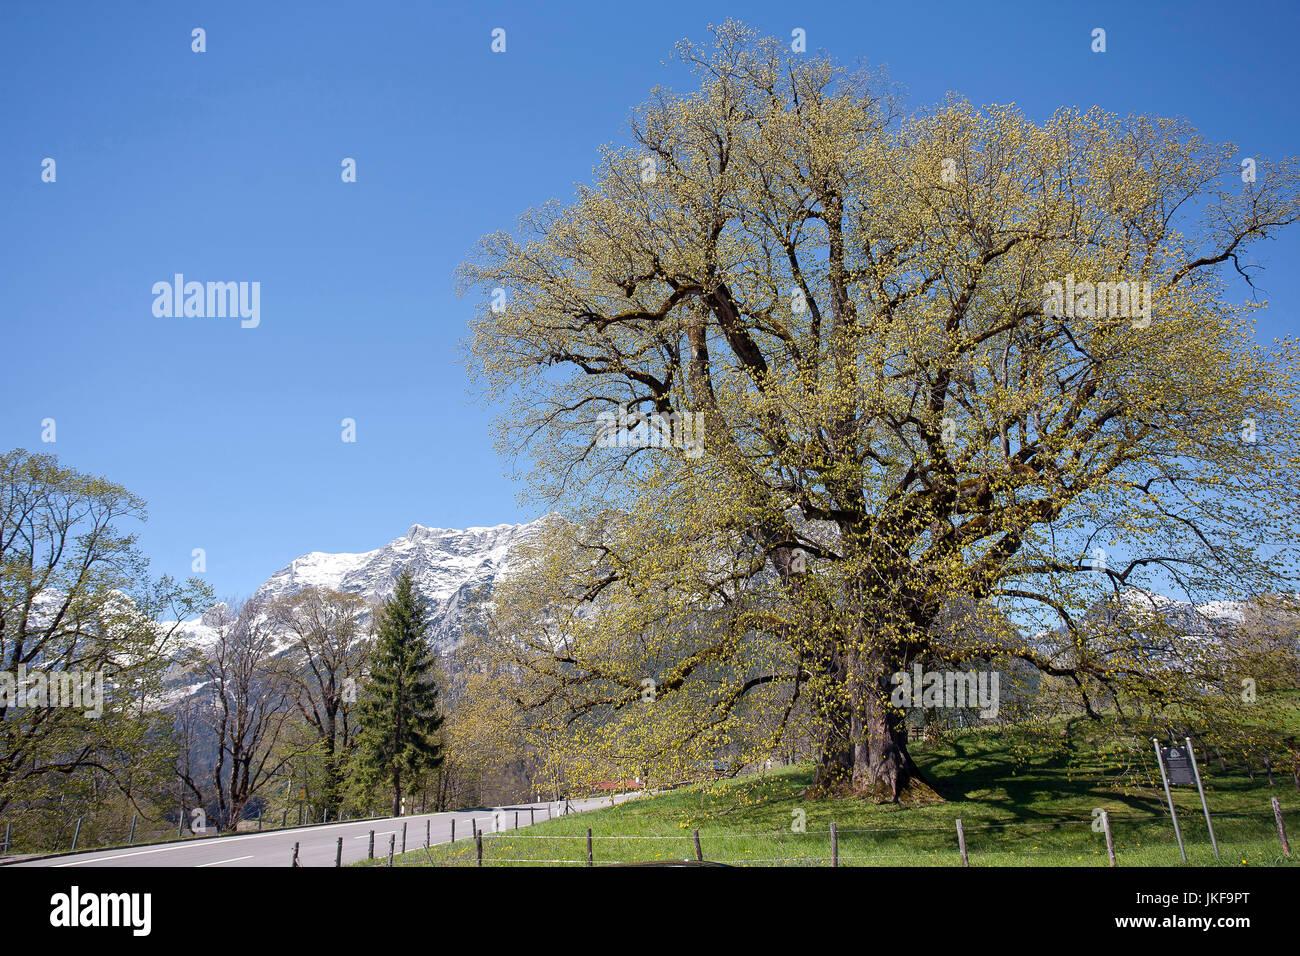 Germany, Bavaria, Ramsau, large leaved linden Hindenburglinde Stock Photo